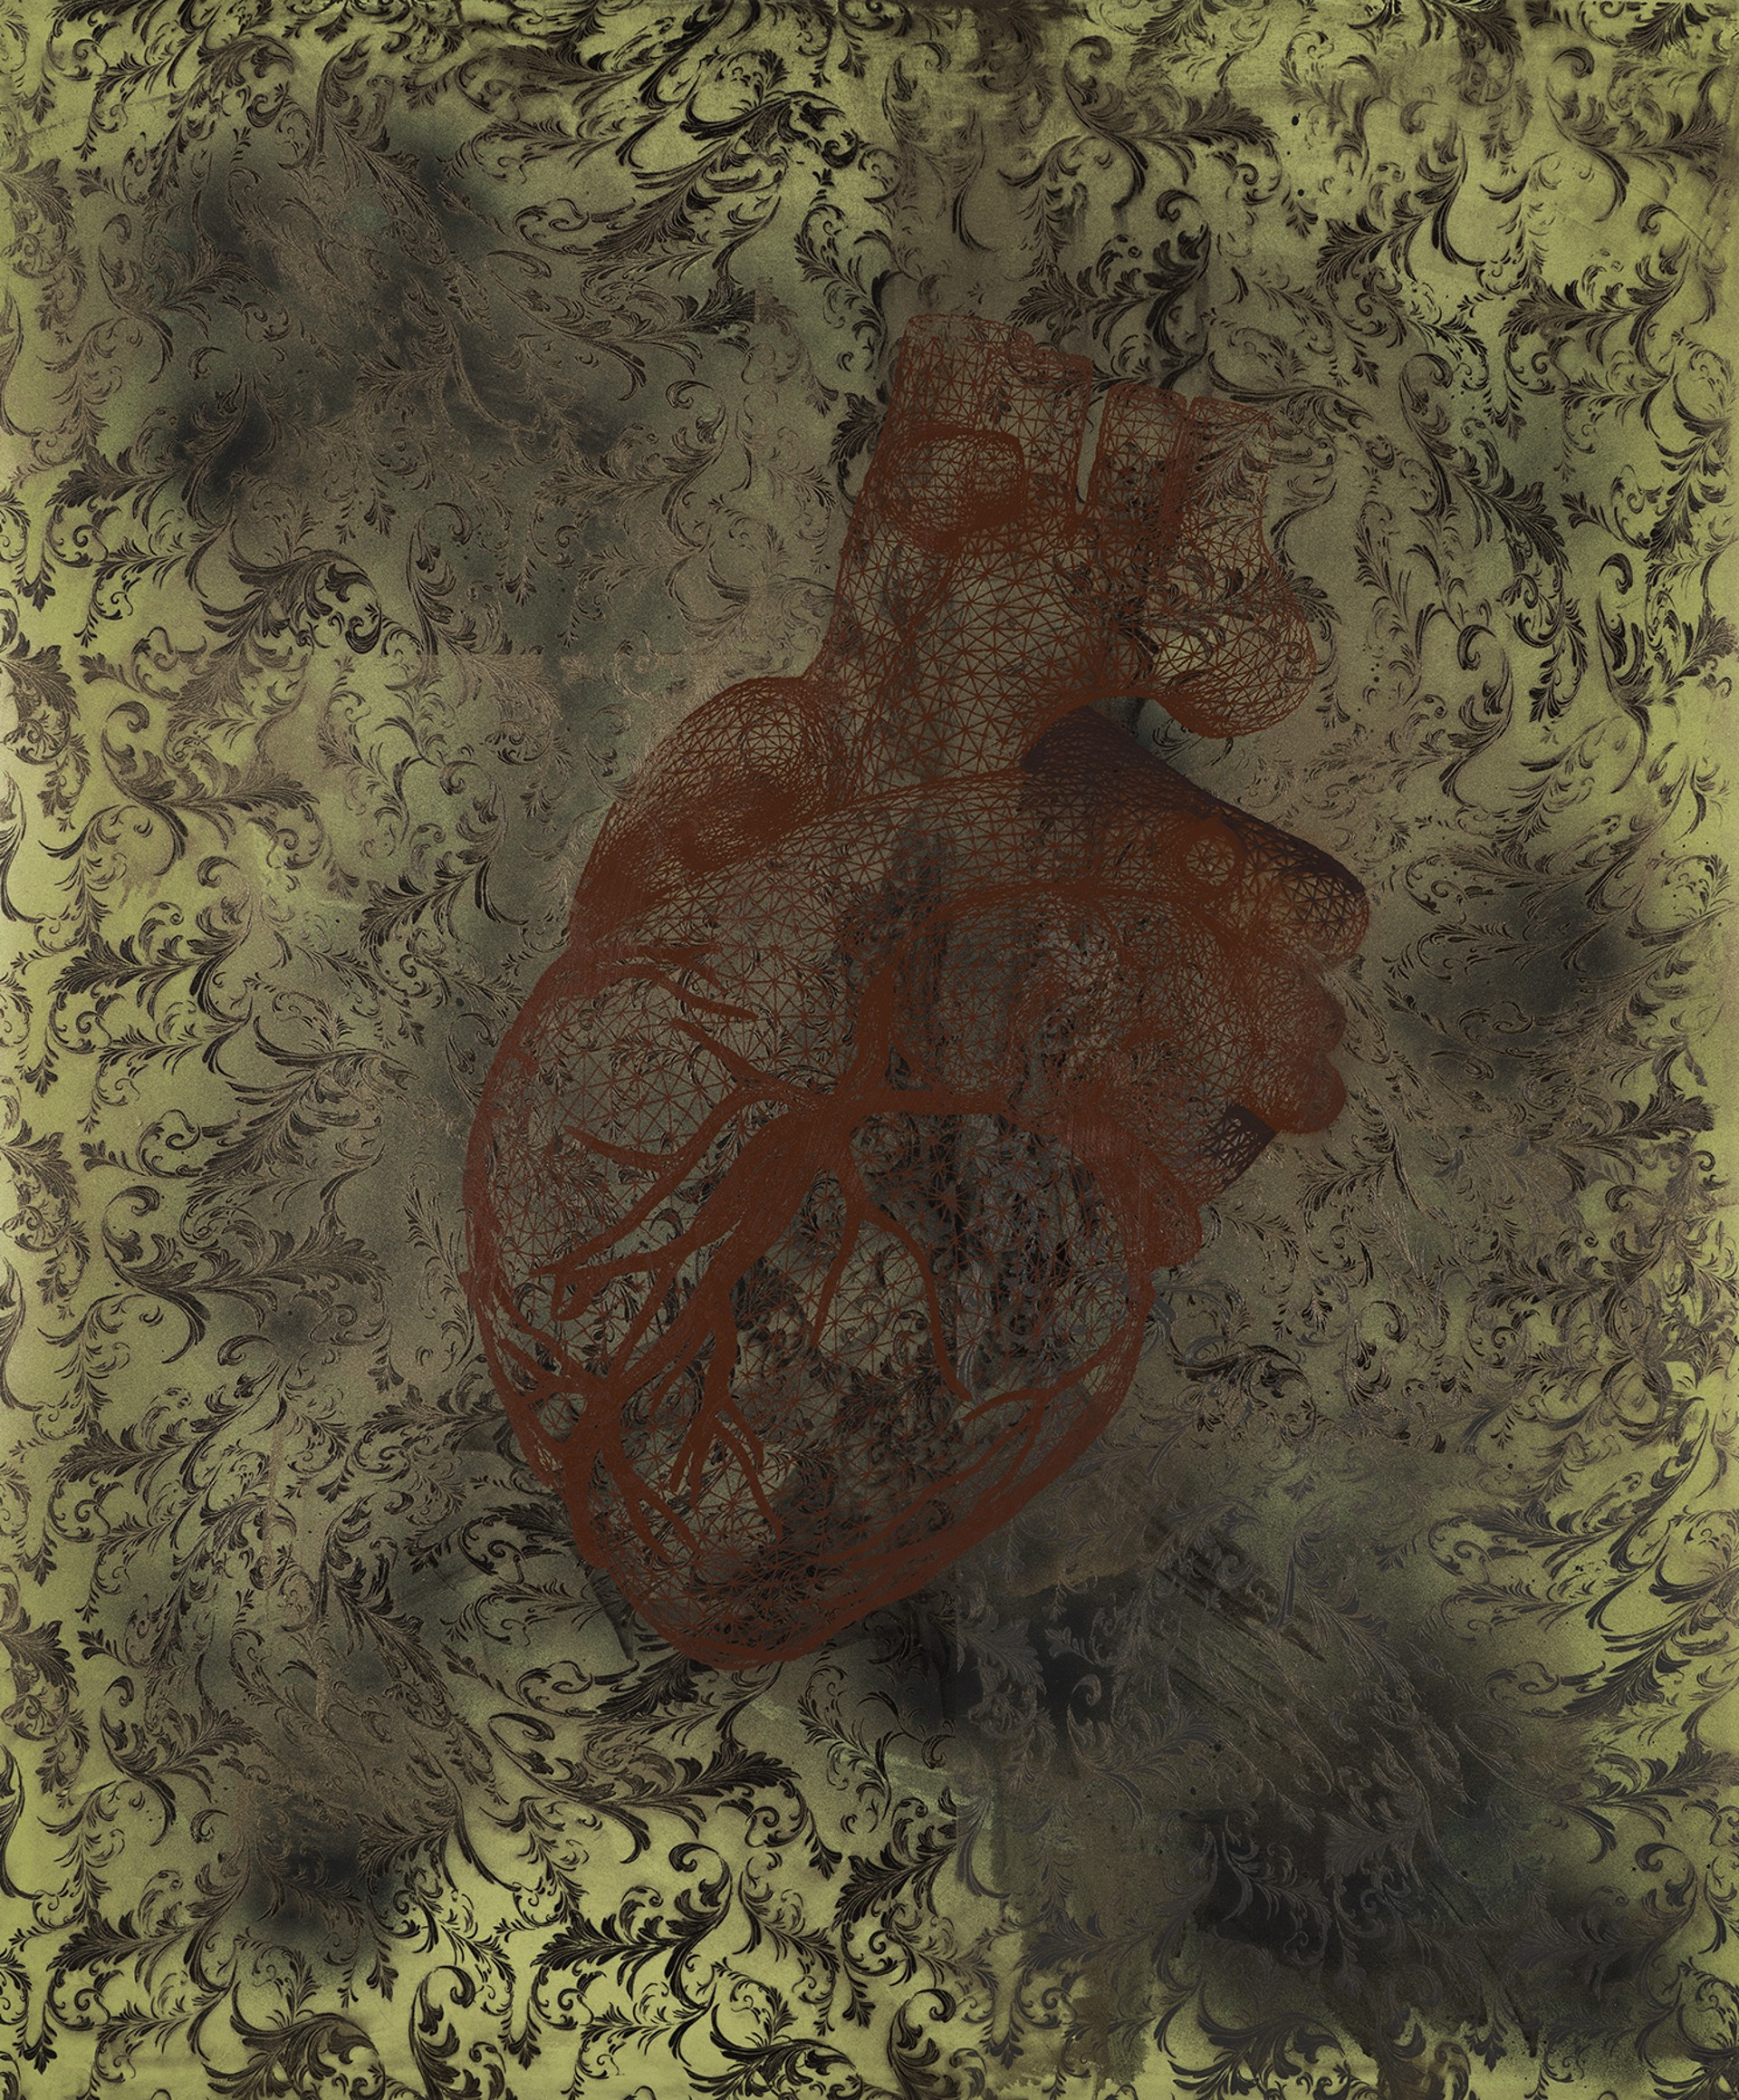 Gilded by Dorothea Van Camp